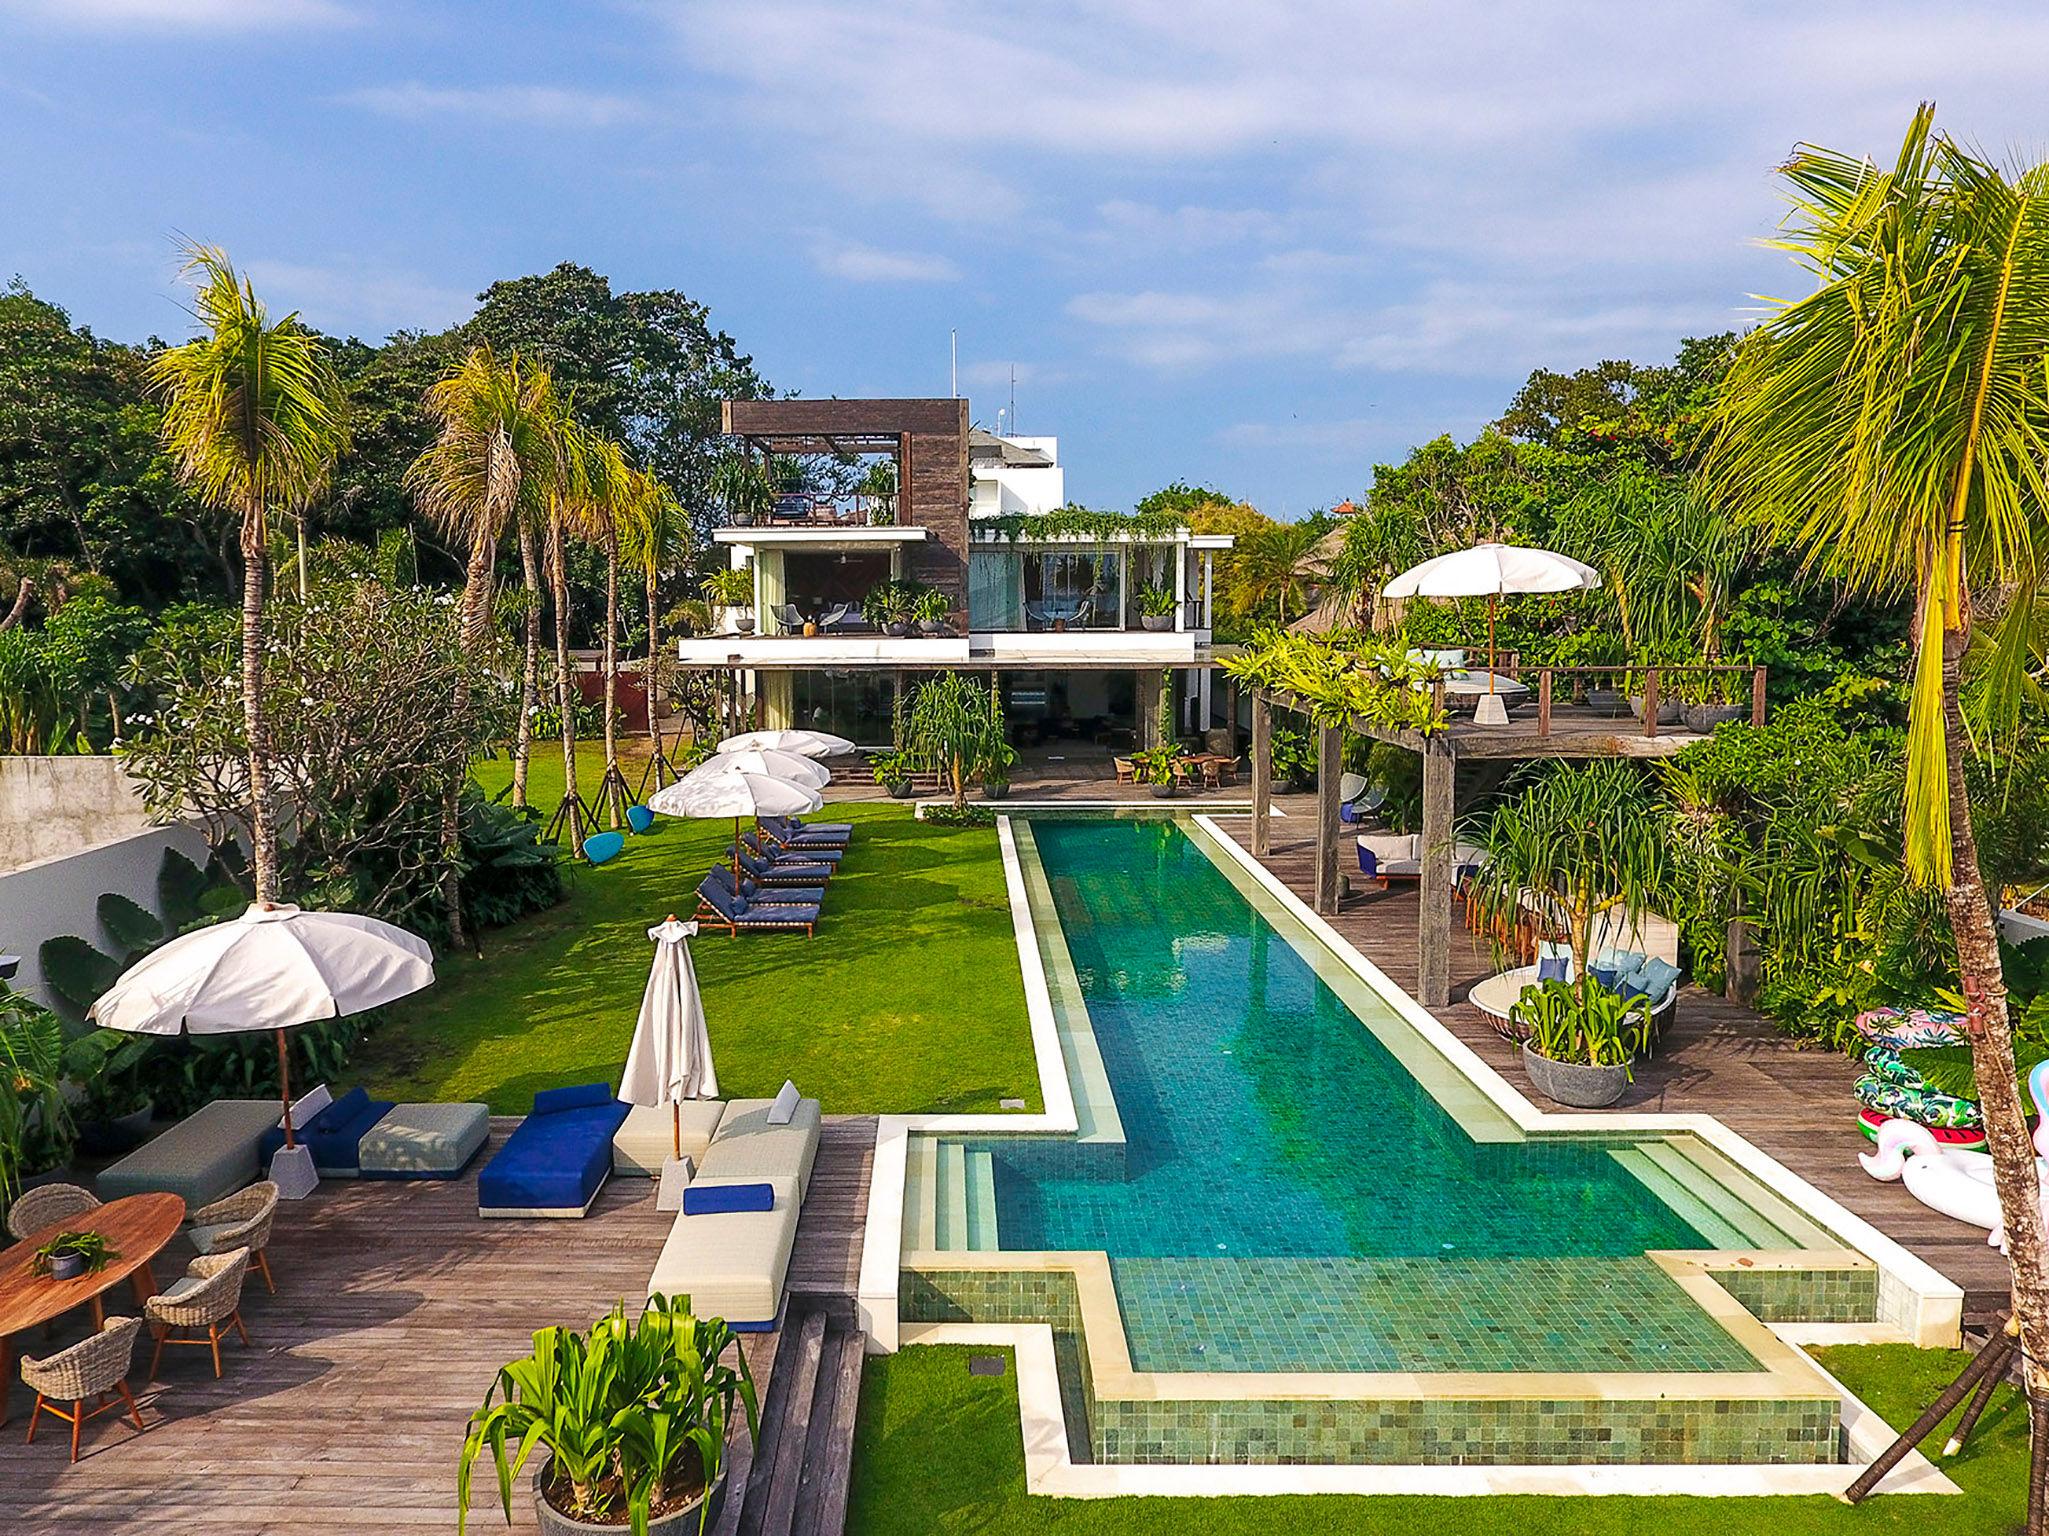 Noku Beach House - Superb outdoor spaces